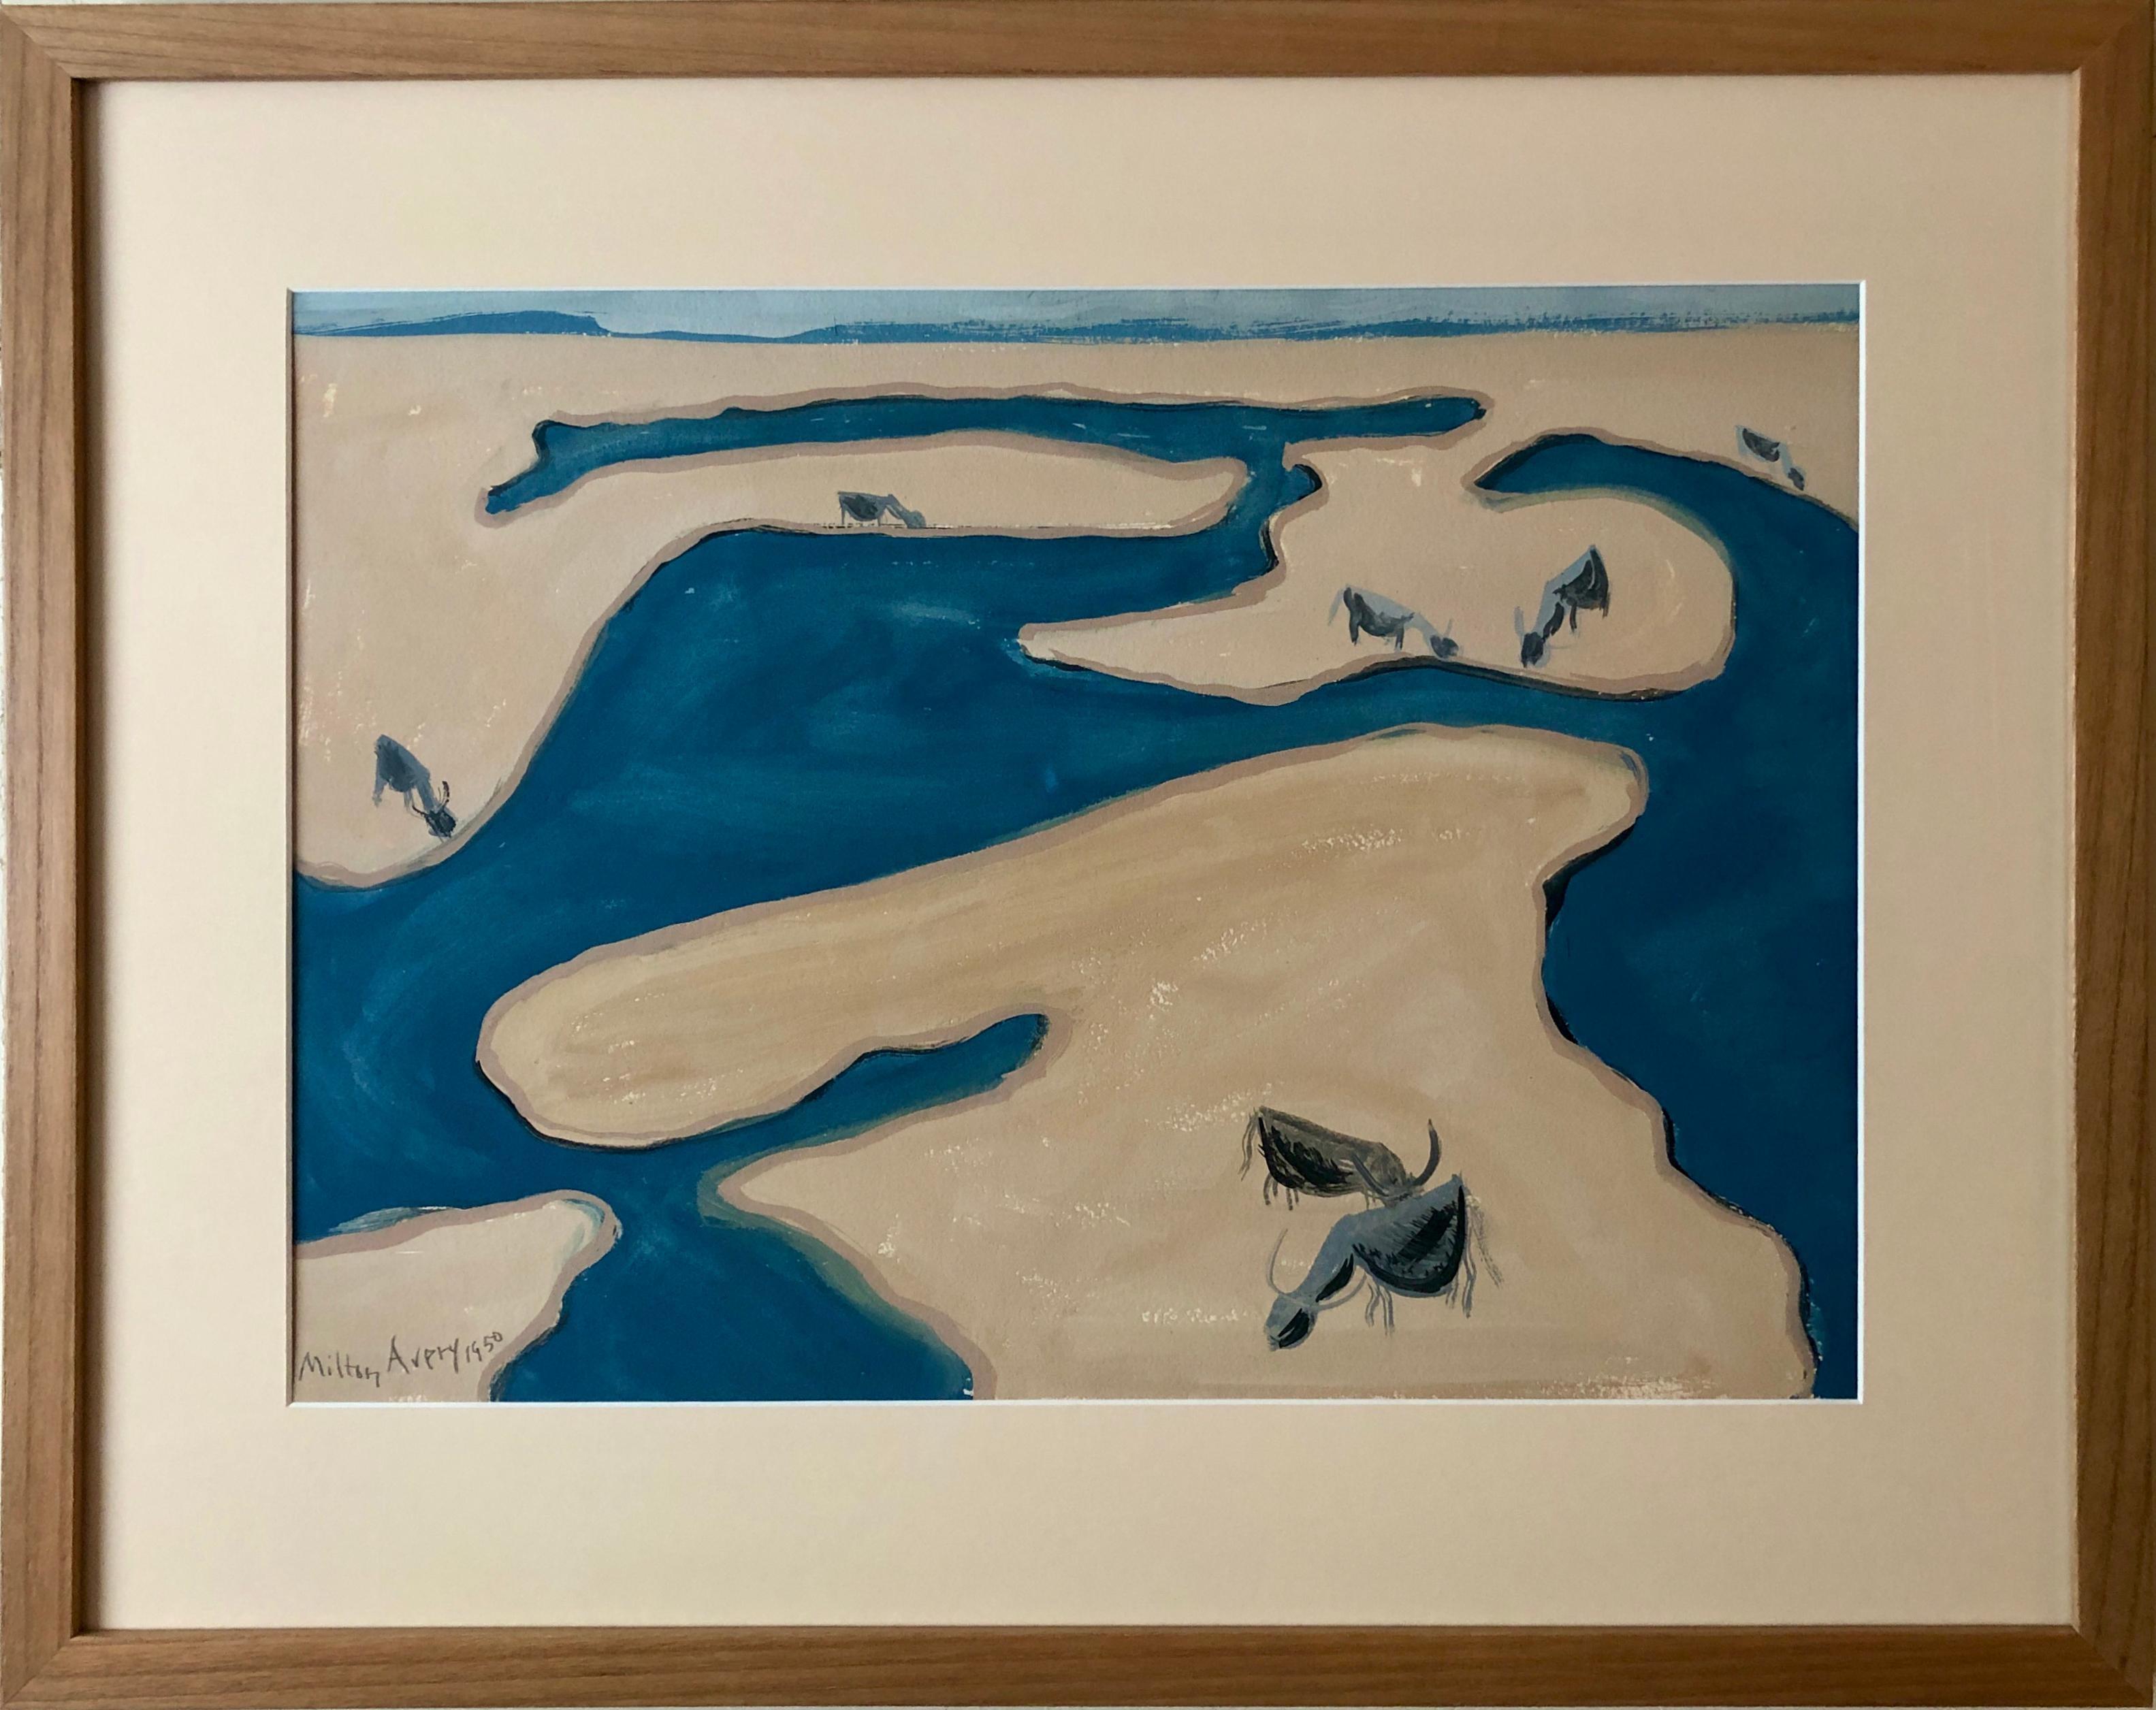 """Grazing Cows"" by Milton Avery, Gouache on paper board,  1950"